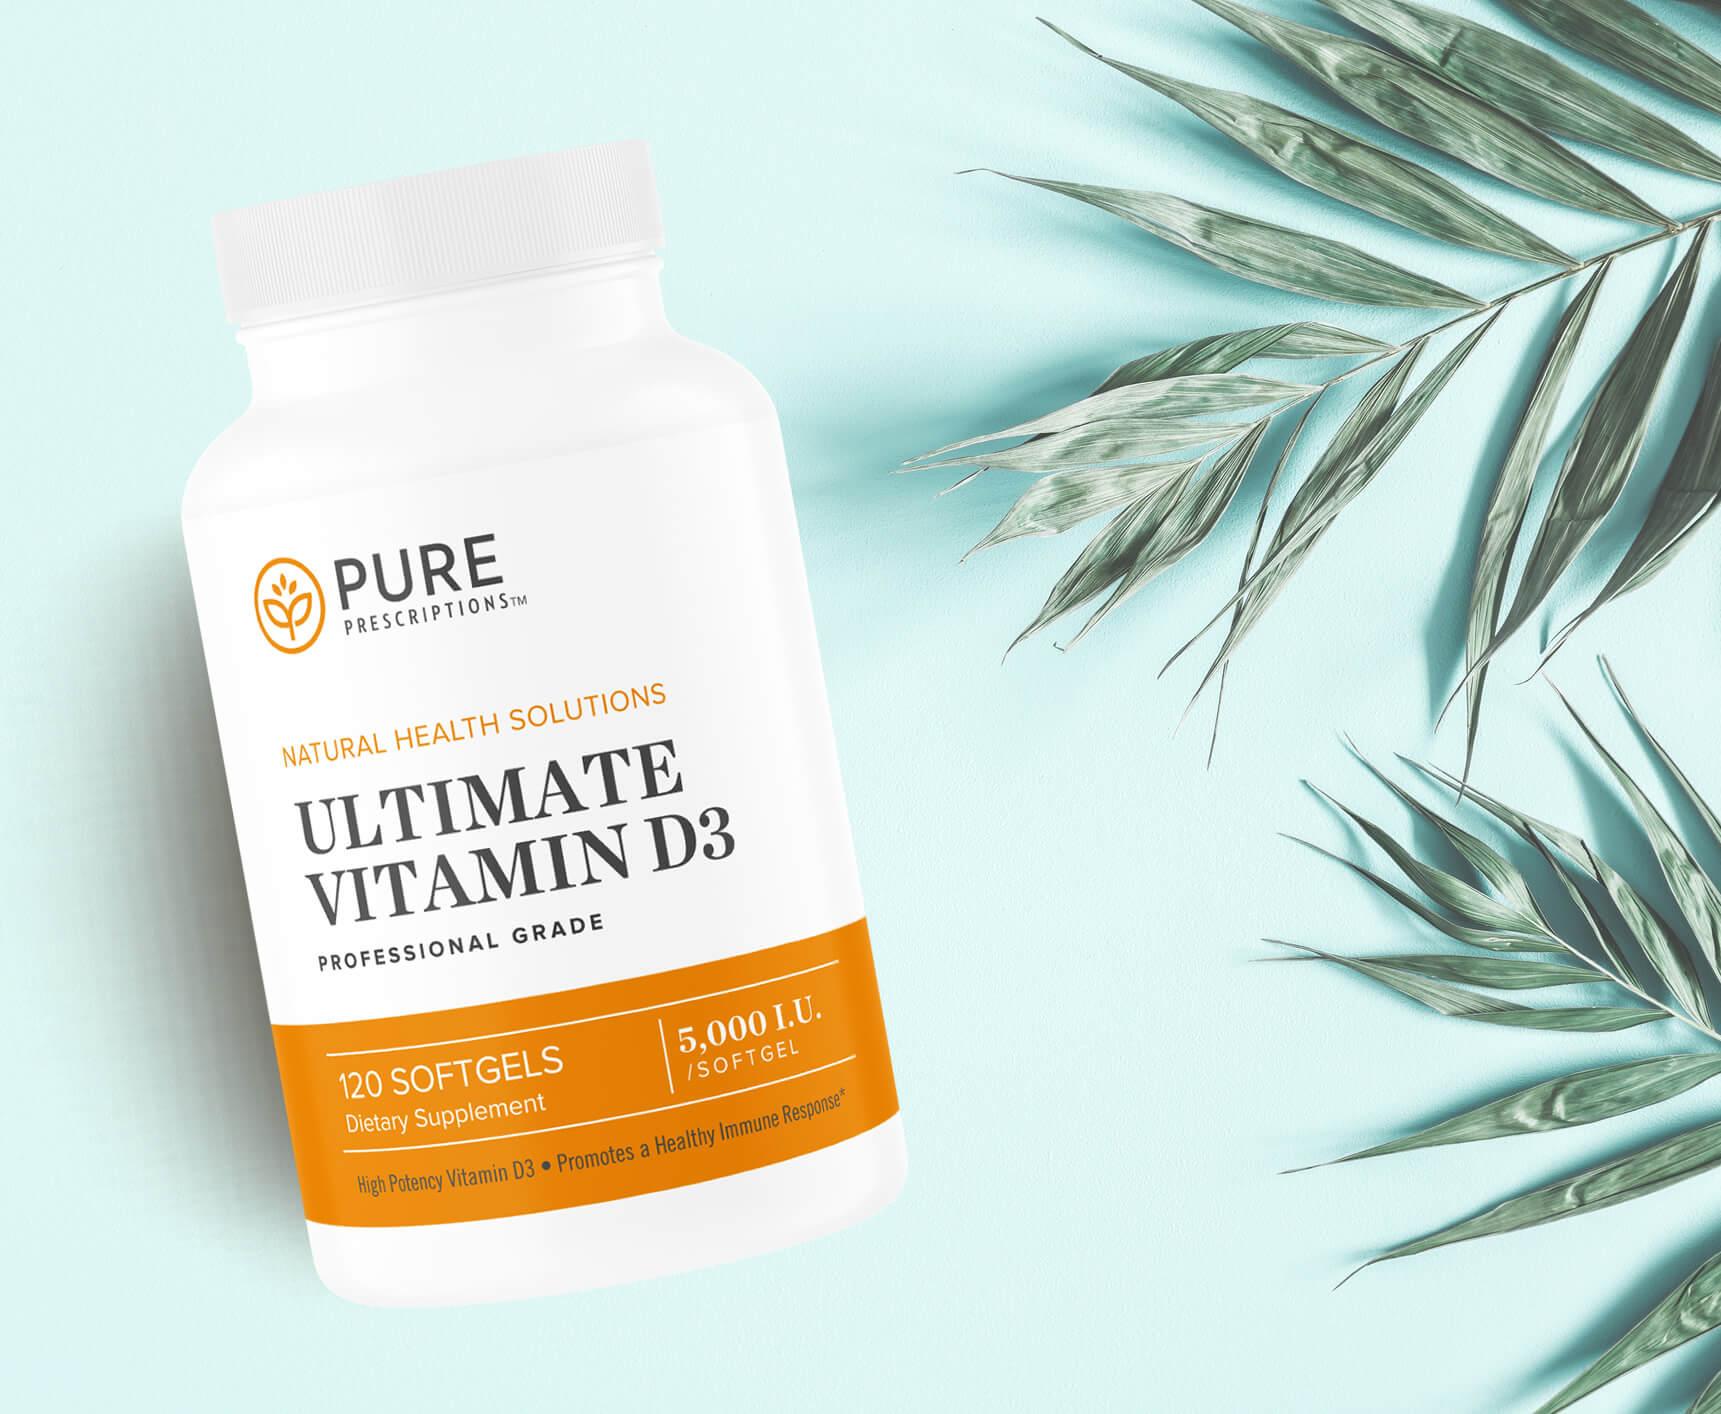 5,000 IU Vitamin D